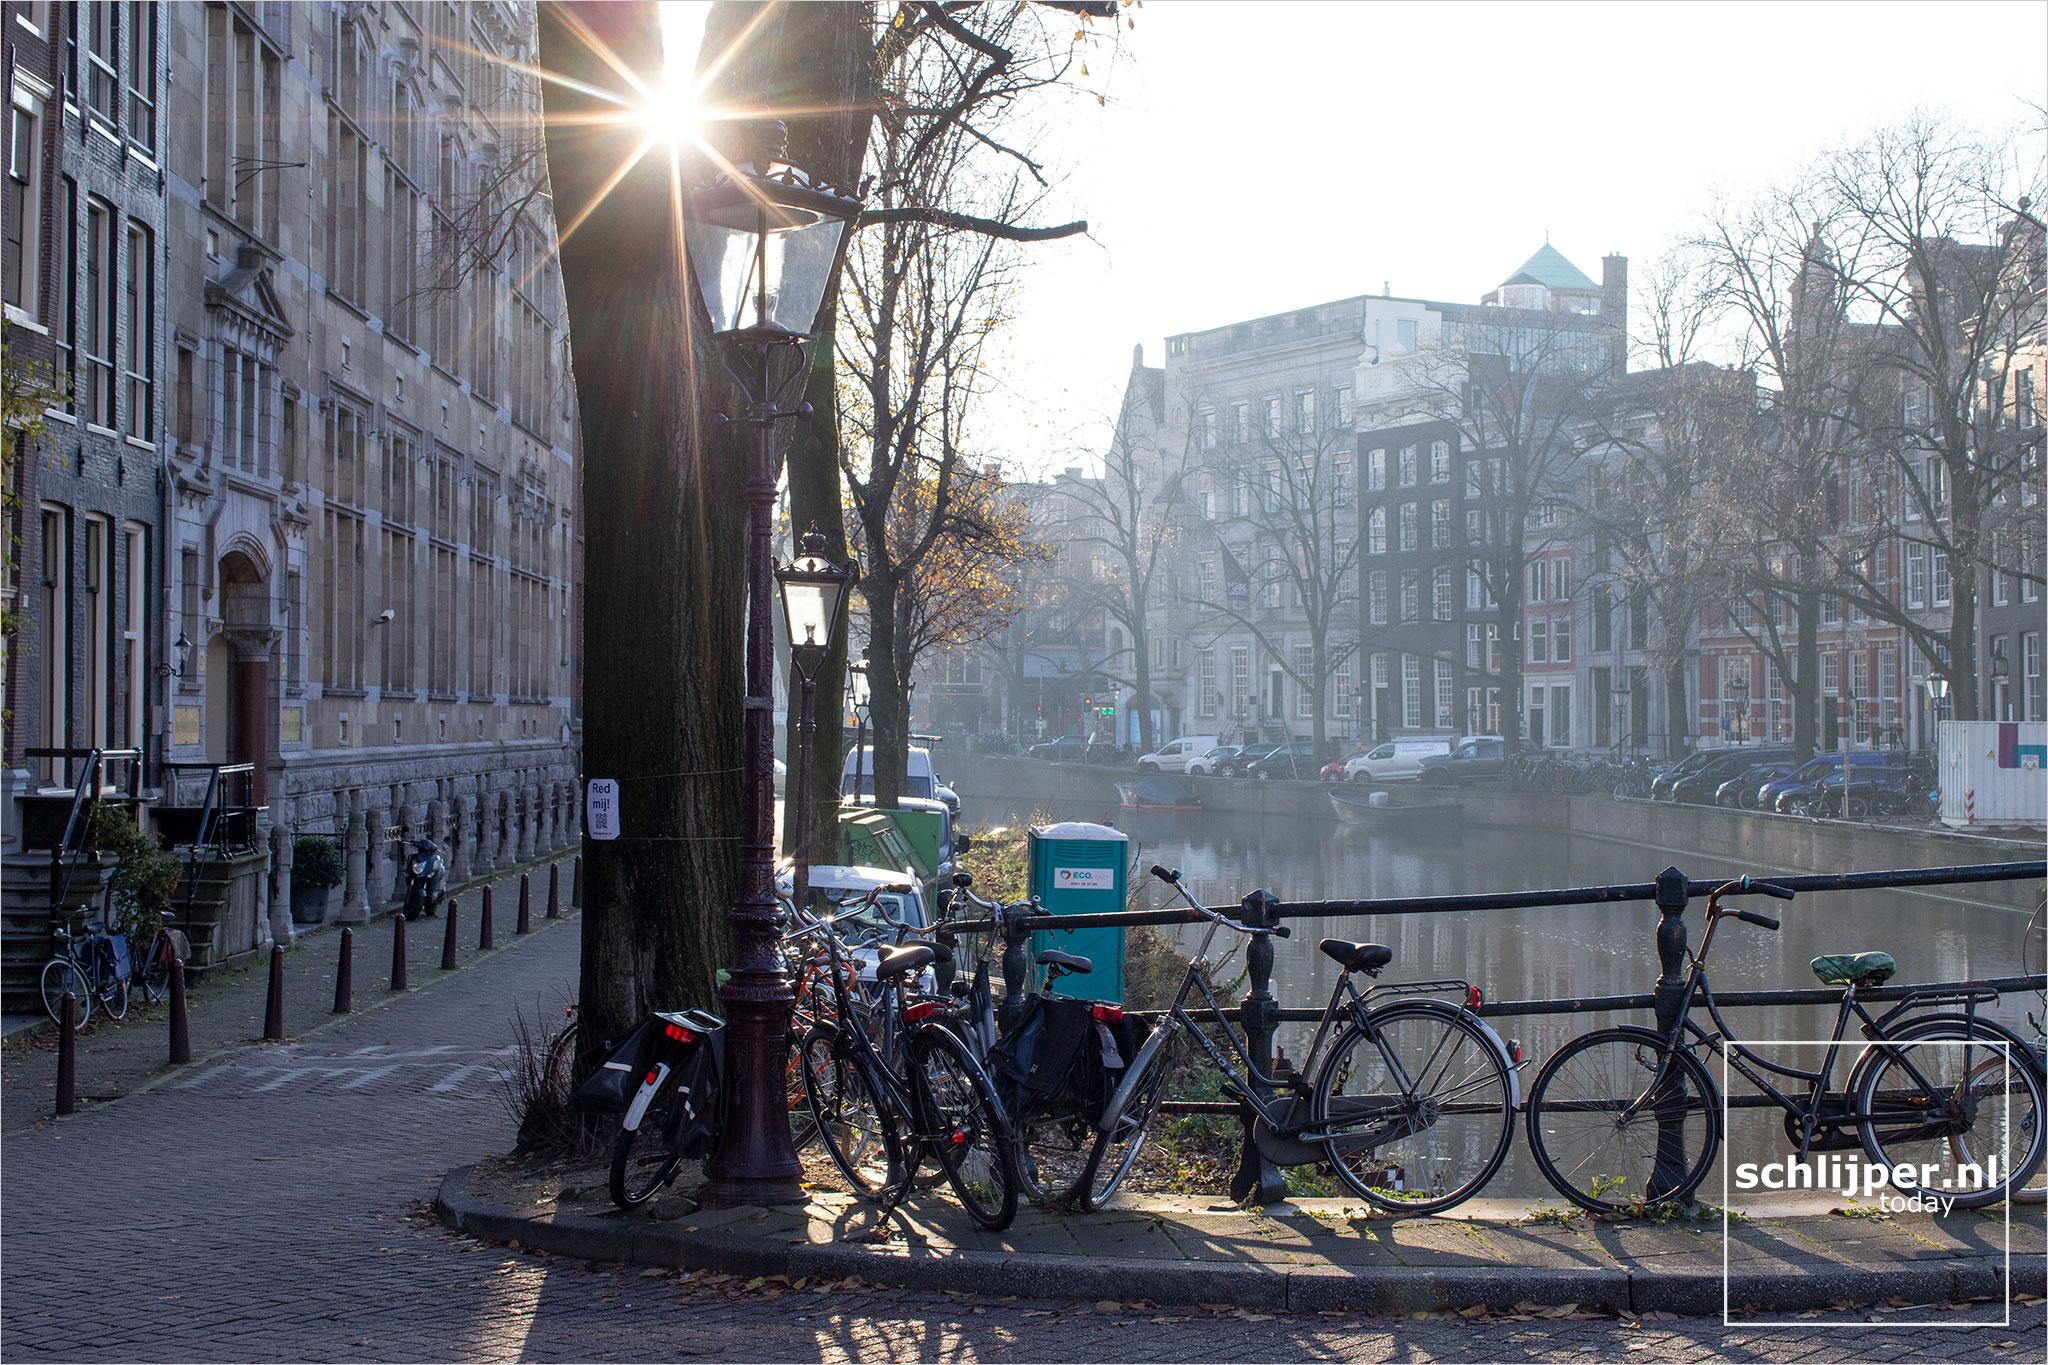 The Netherlands, Amsterdam, 10 december 2020